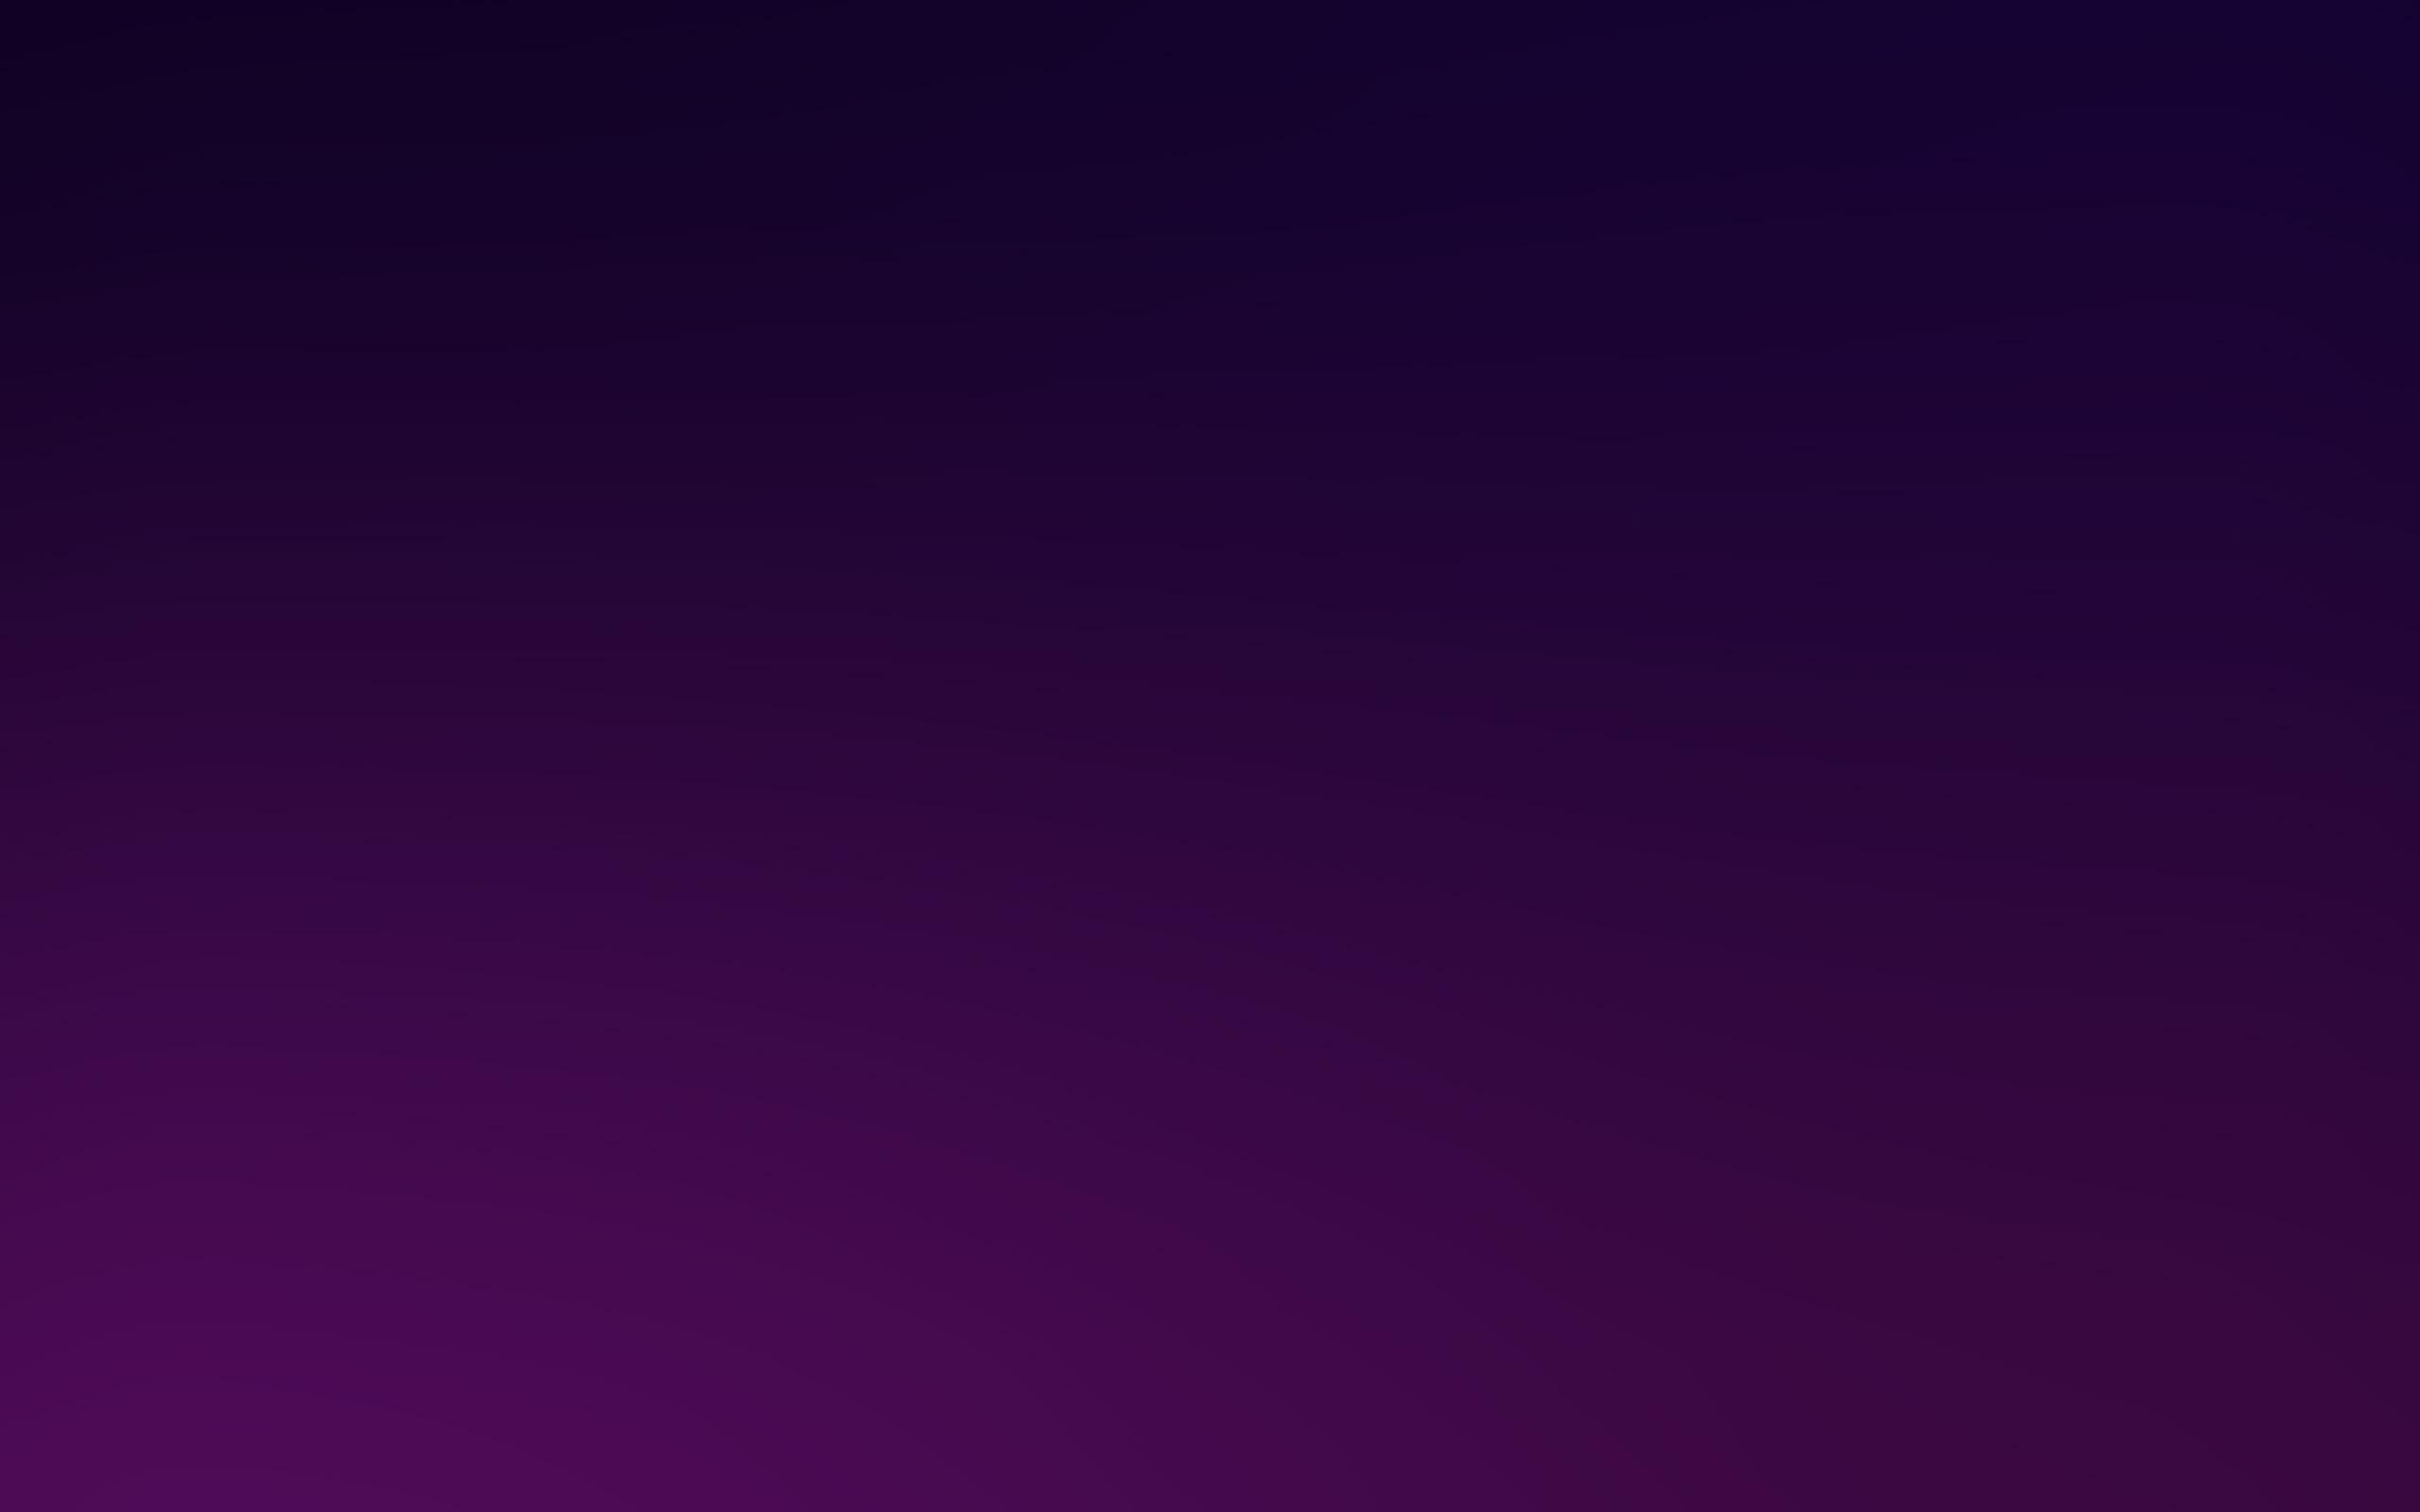 Sk61 Dark Purple Blur Gradation Wallpaper